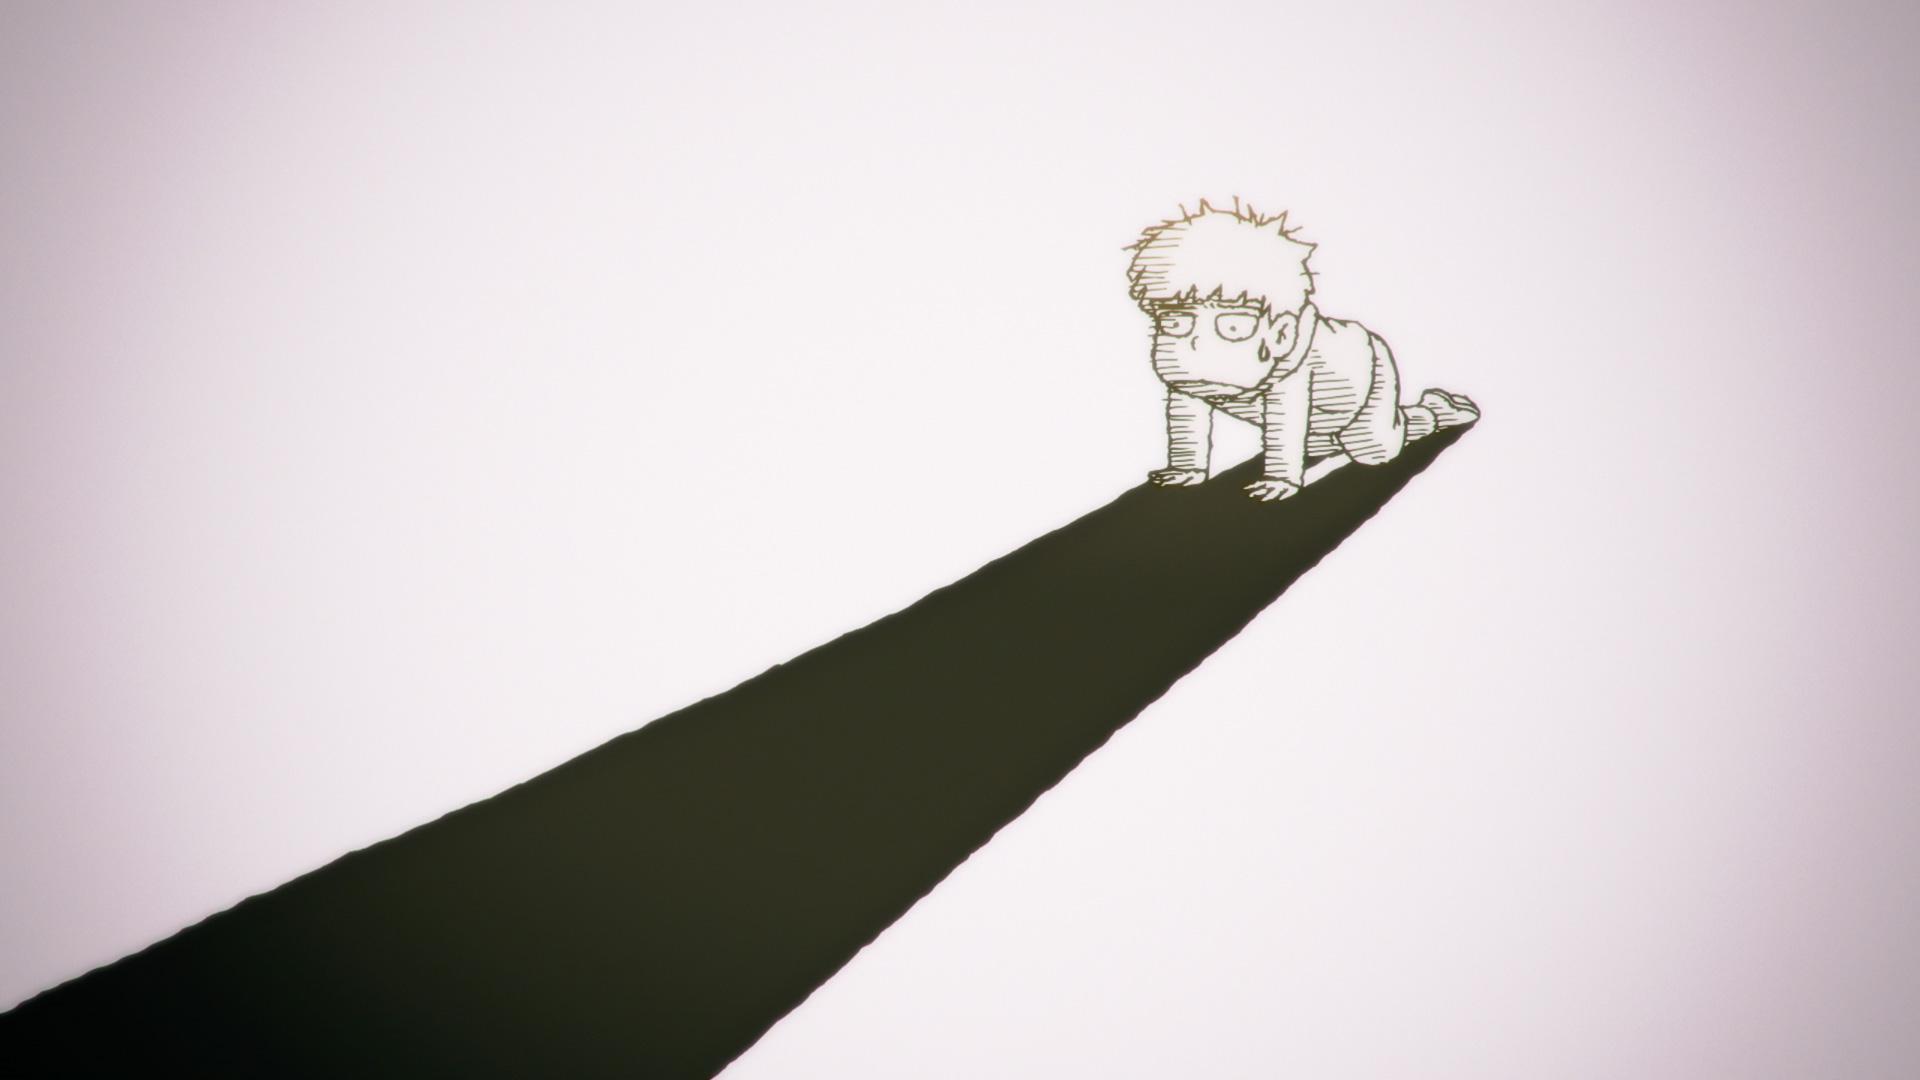 TVアニメ「がんがんがんこちゃん」アニメーション制作 | 10GAUGE